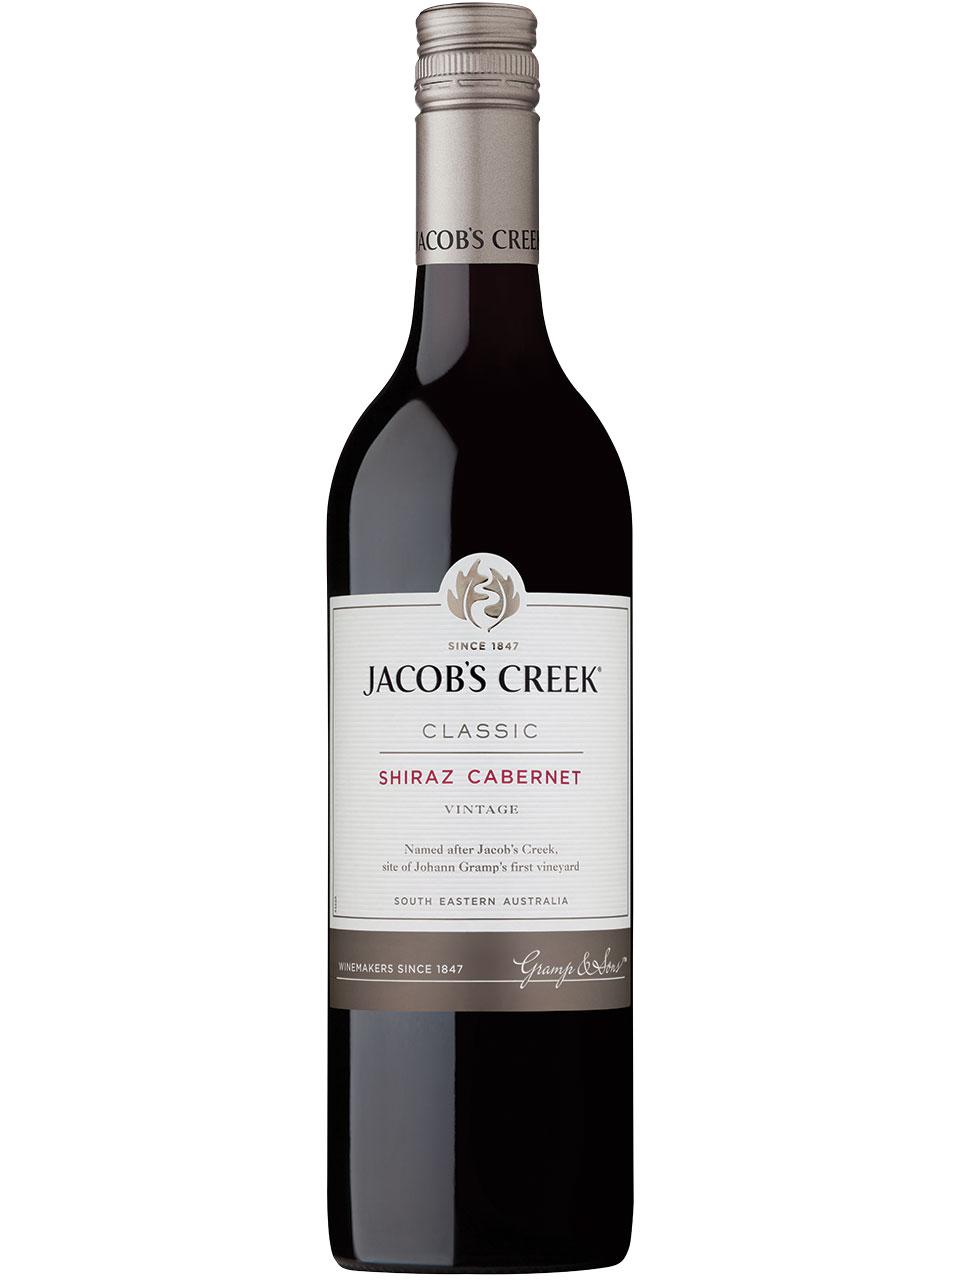 Jacob's Creek Shiraz Cabernet Sauvignon